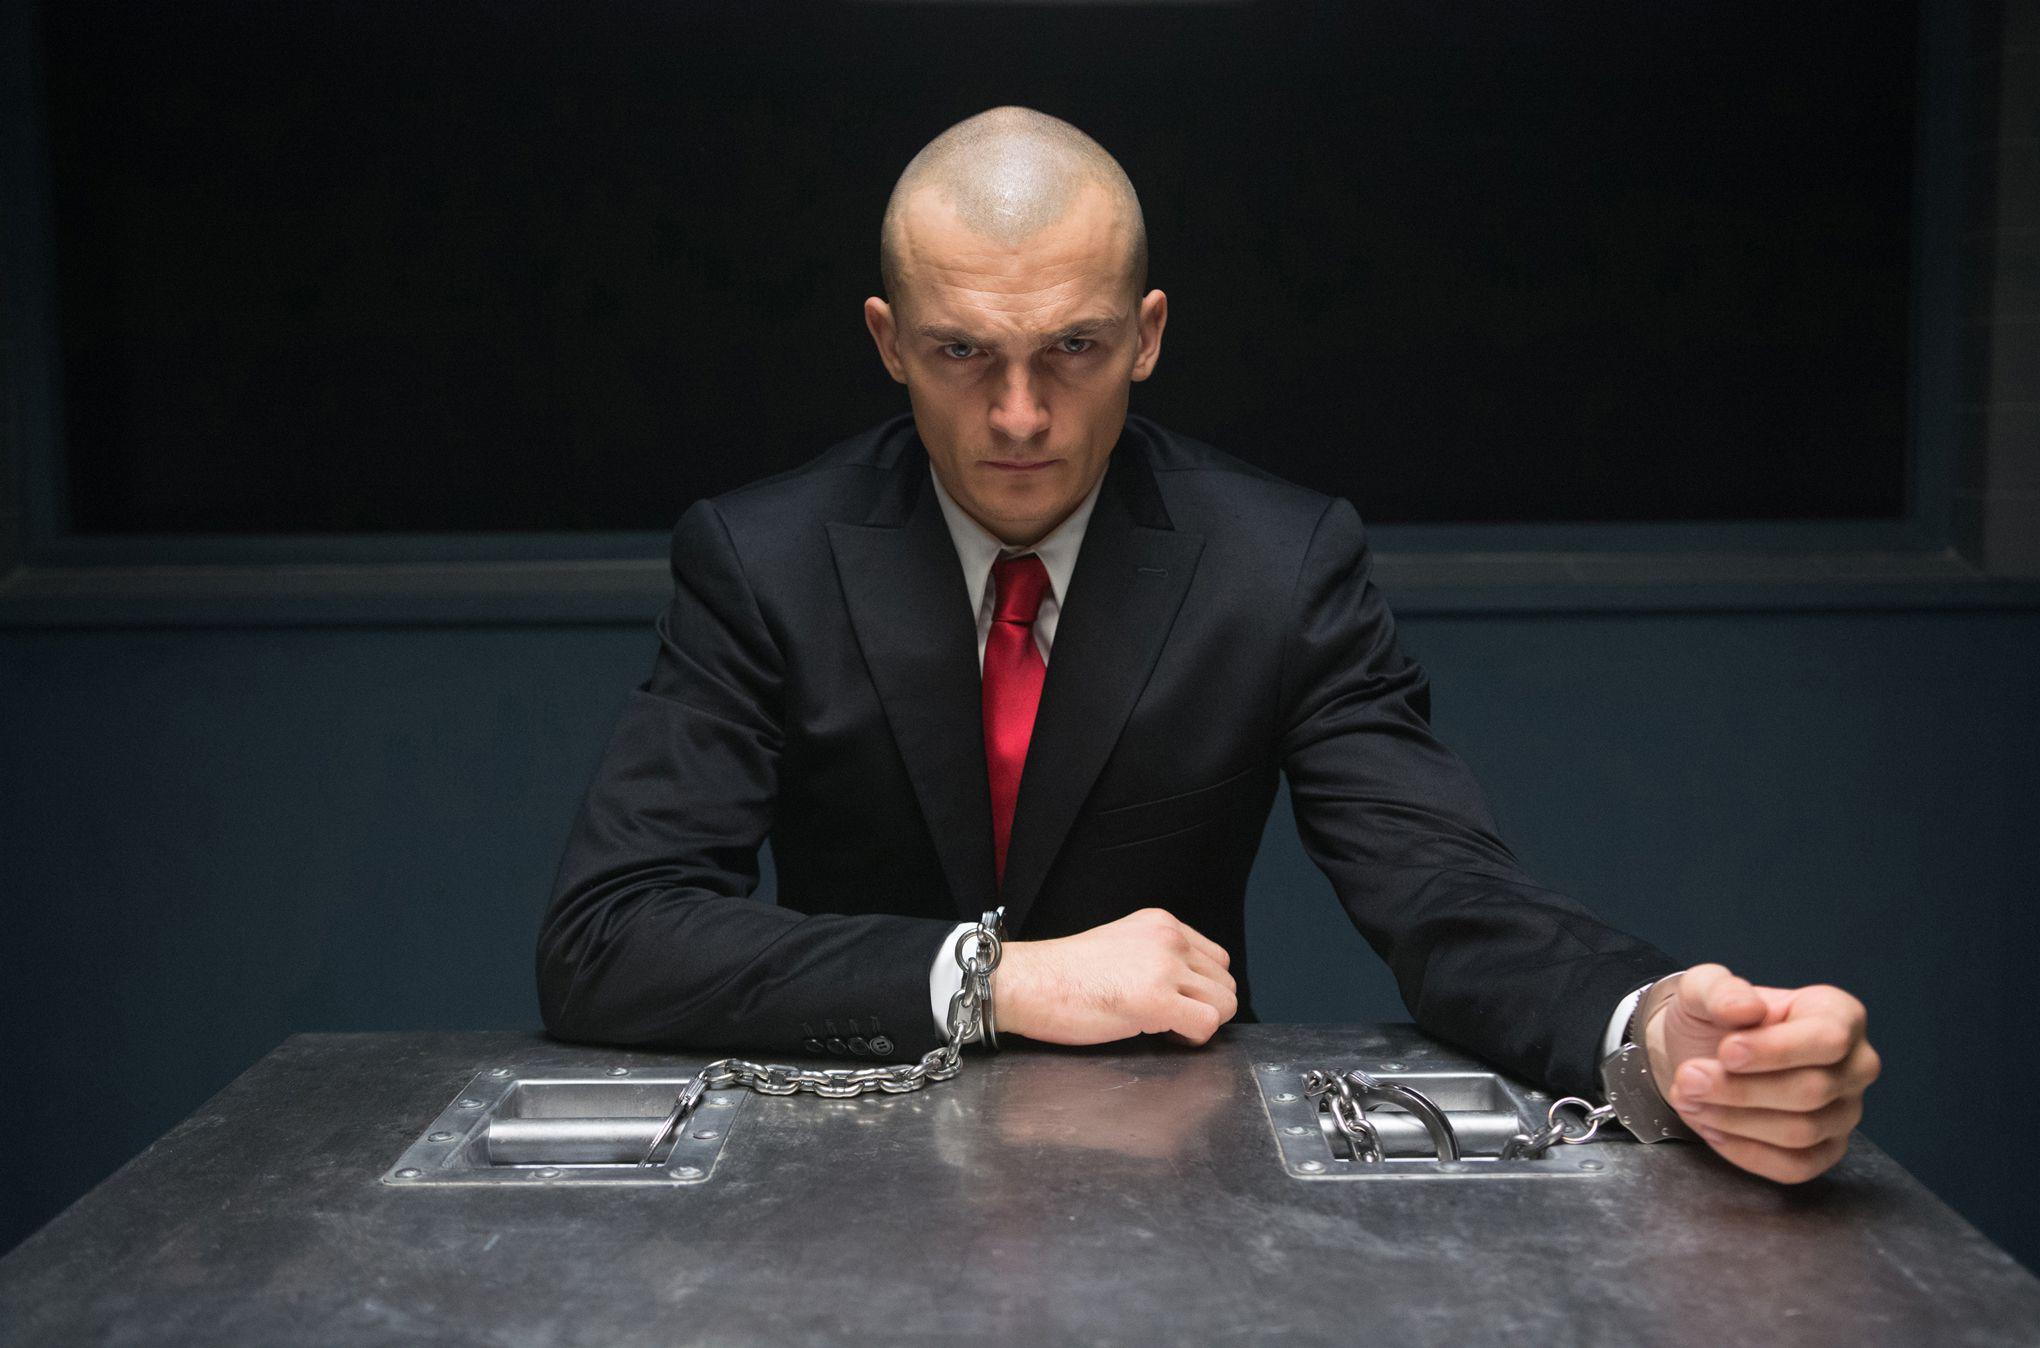 Hitman: Agent 47 promotional still (FOX)